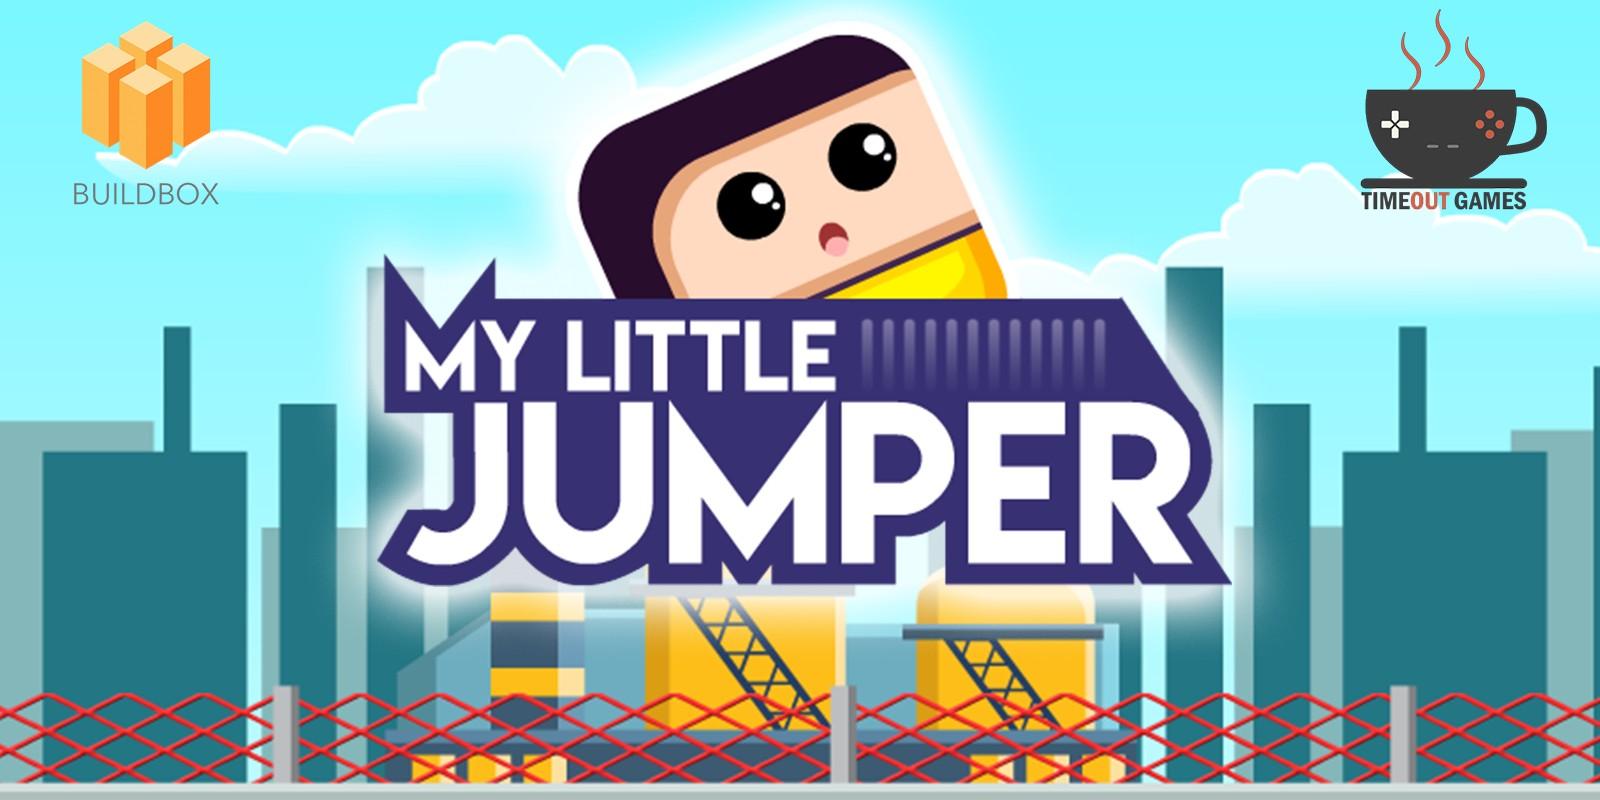 My little Jumper - Full Buildbox Game